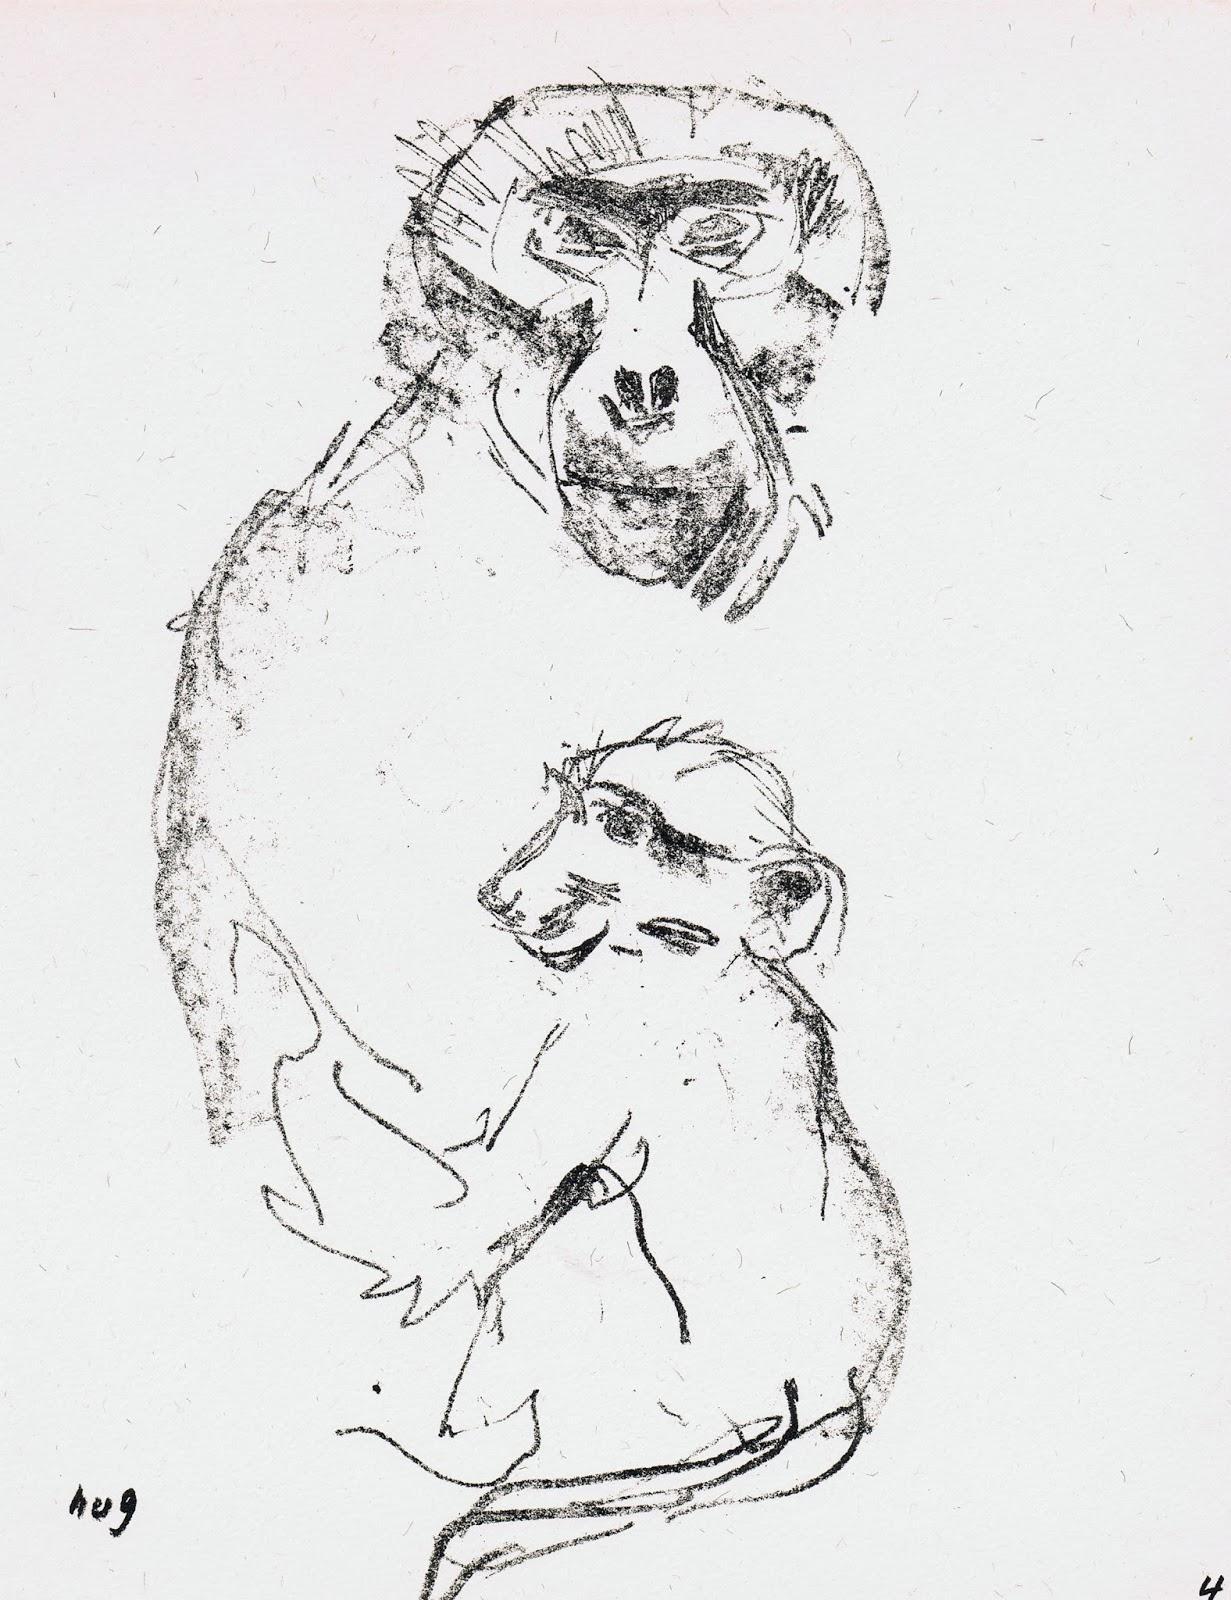 deja view hug animal drawings from the zoo